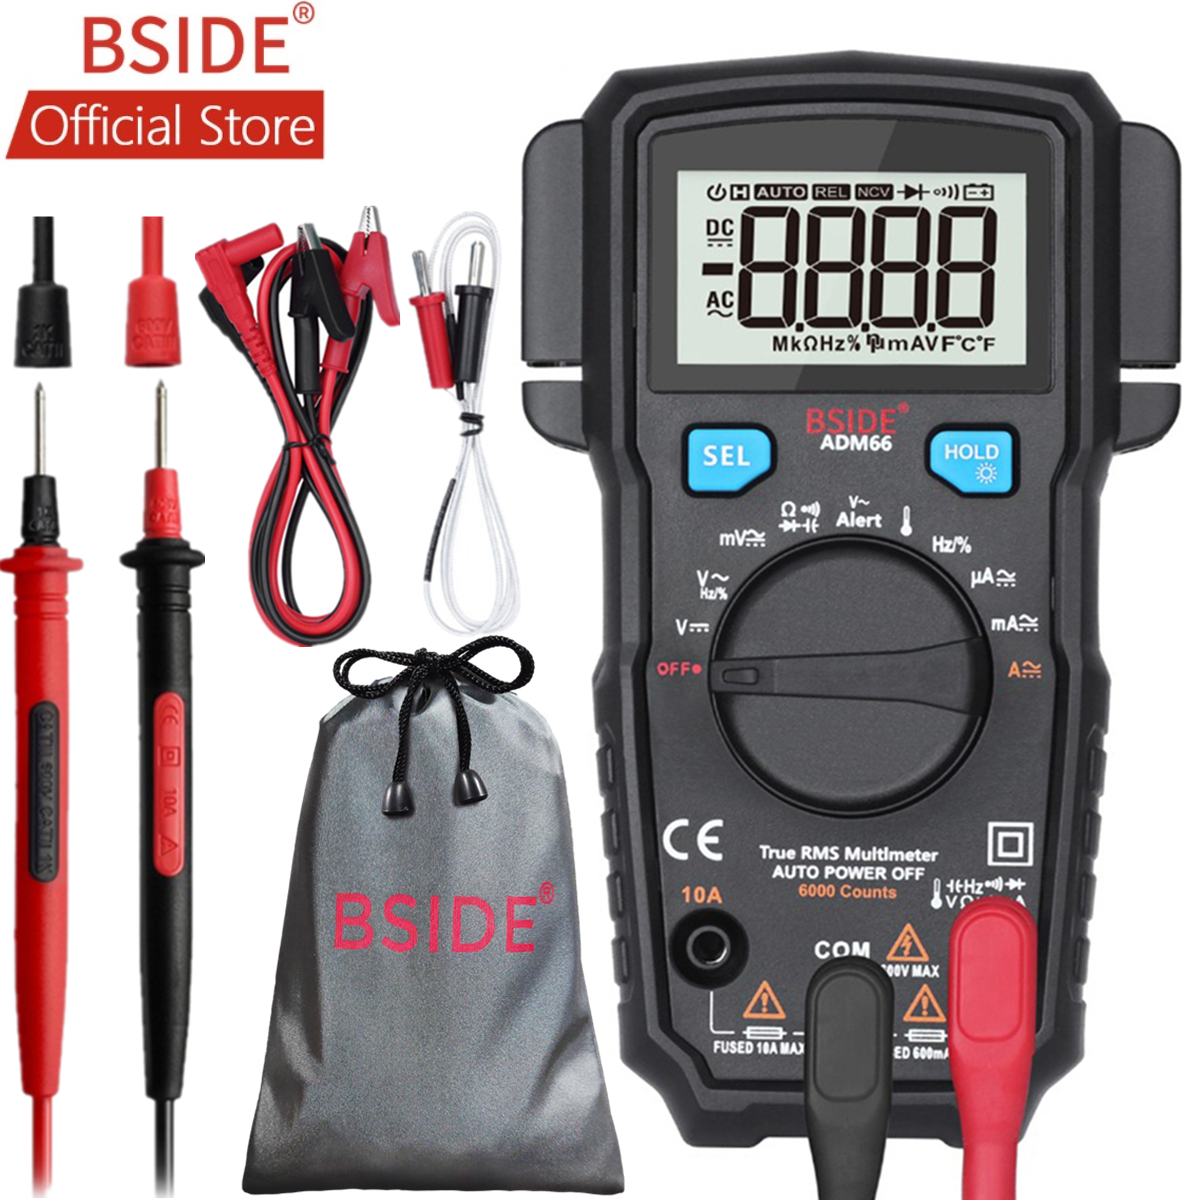 BSIDE ADM66 True RMS Digital Multimeter Auto Range TRMS Mini 6000 DMM Dual Slot Capacitance ohm Hz Temp NCV Diode Pocket Tester